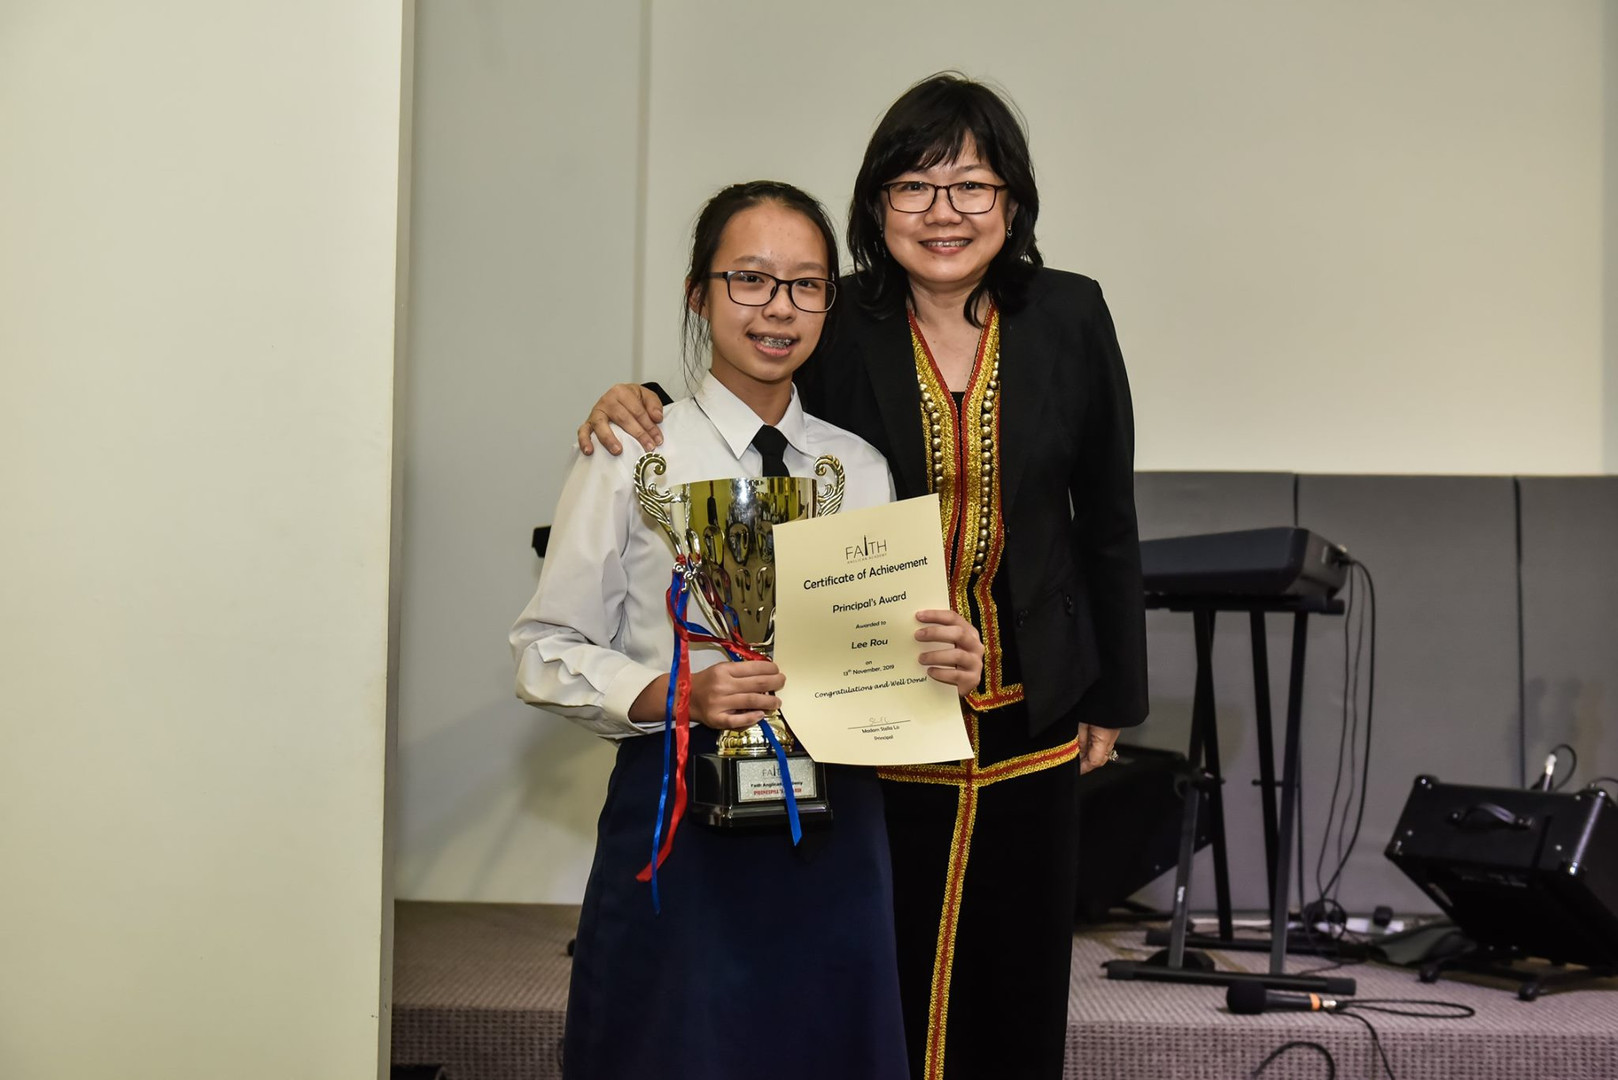 Principal's Award Recipient for 2019 - Lee Rou